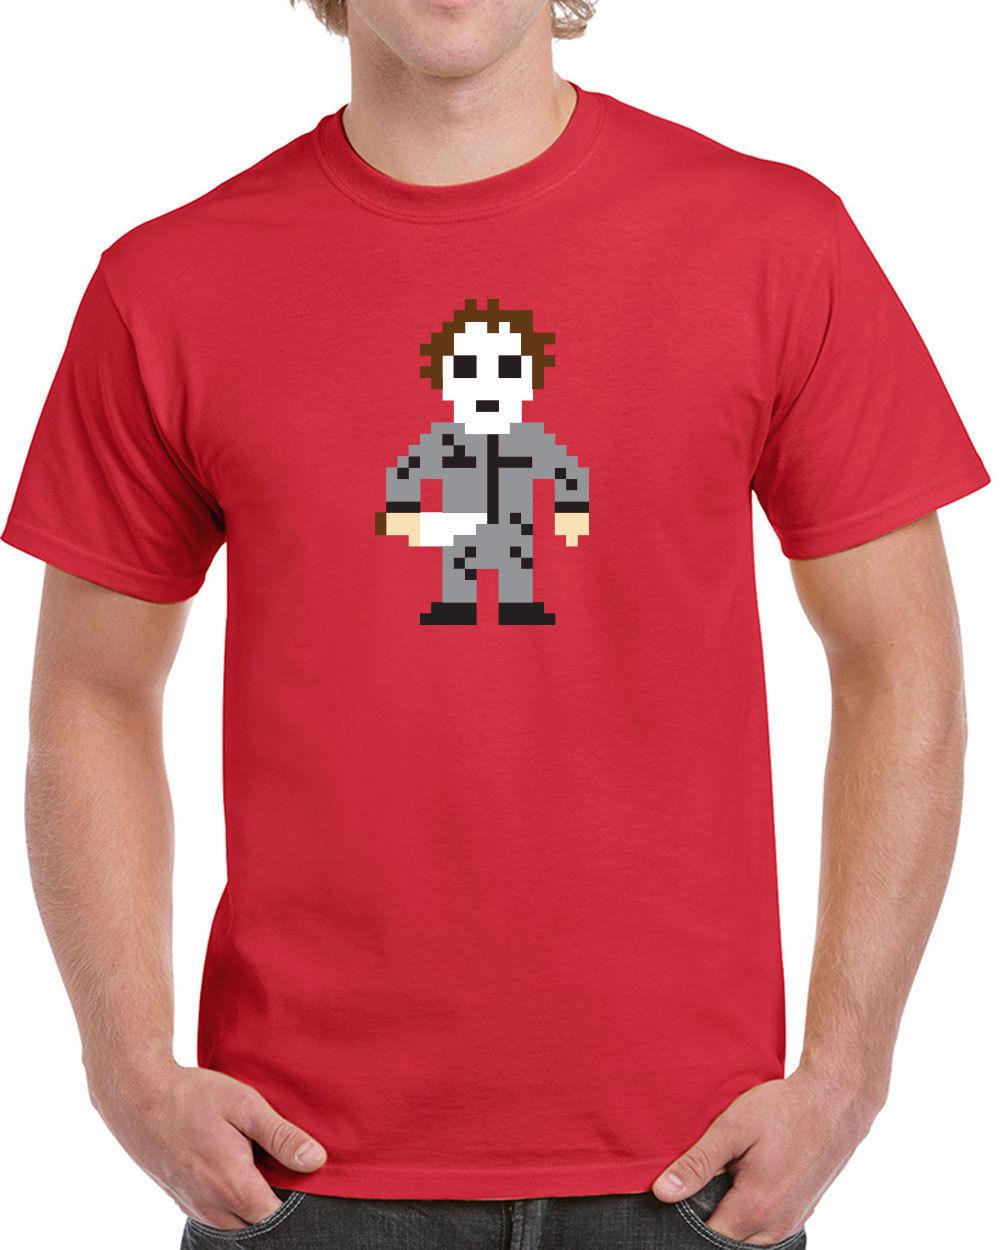 2017 Best T Shirt Websites 8 Bit Halloween Slasher 70s Funny Scary ...